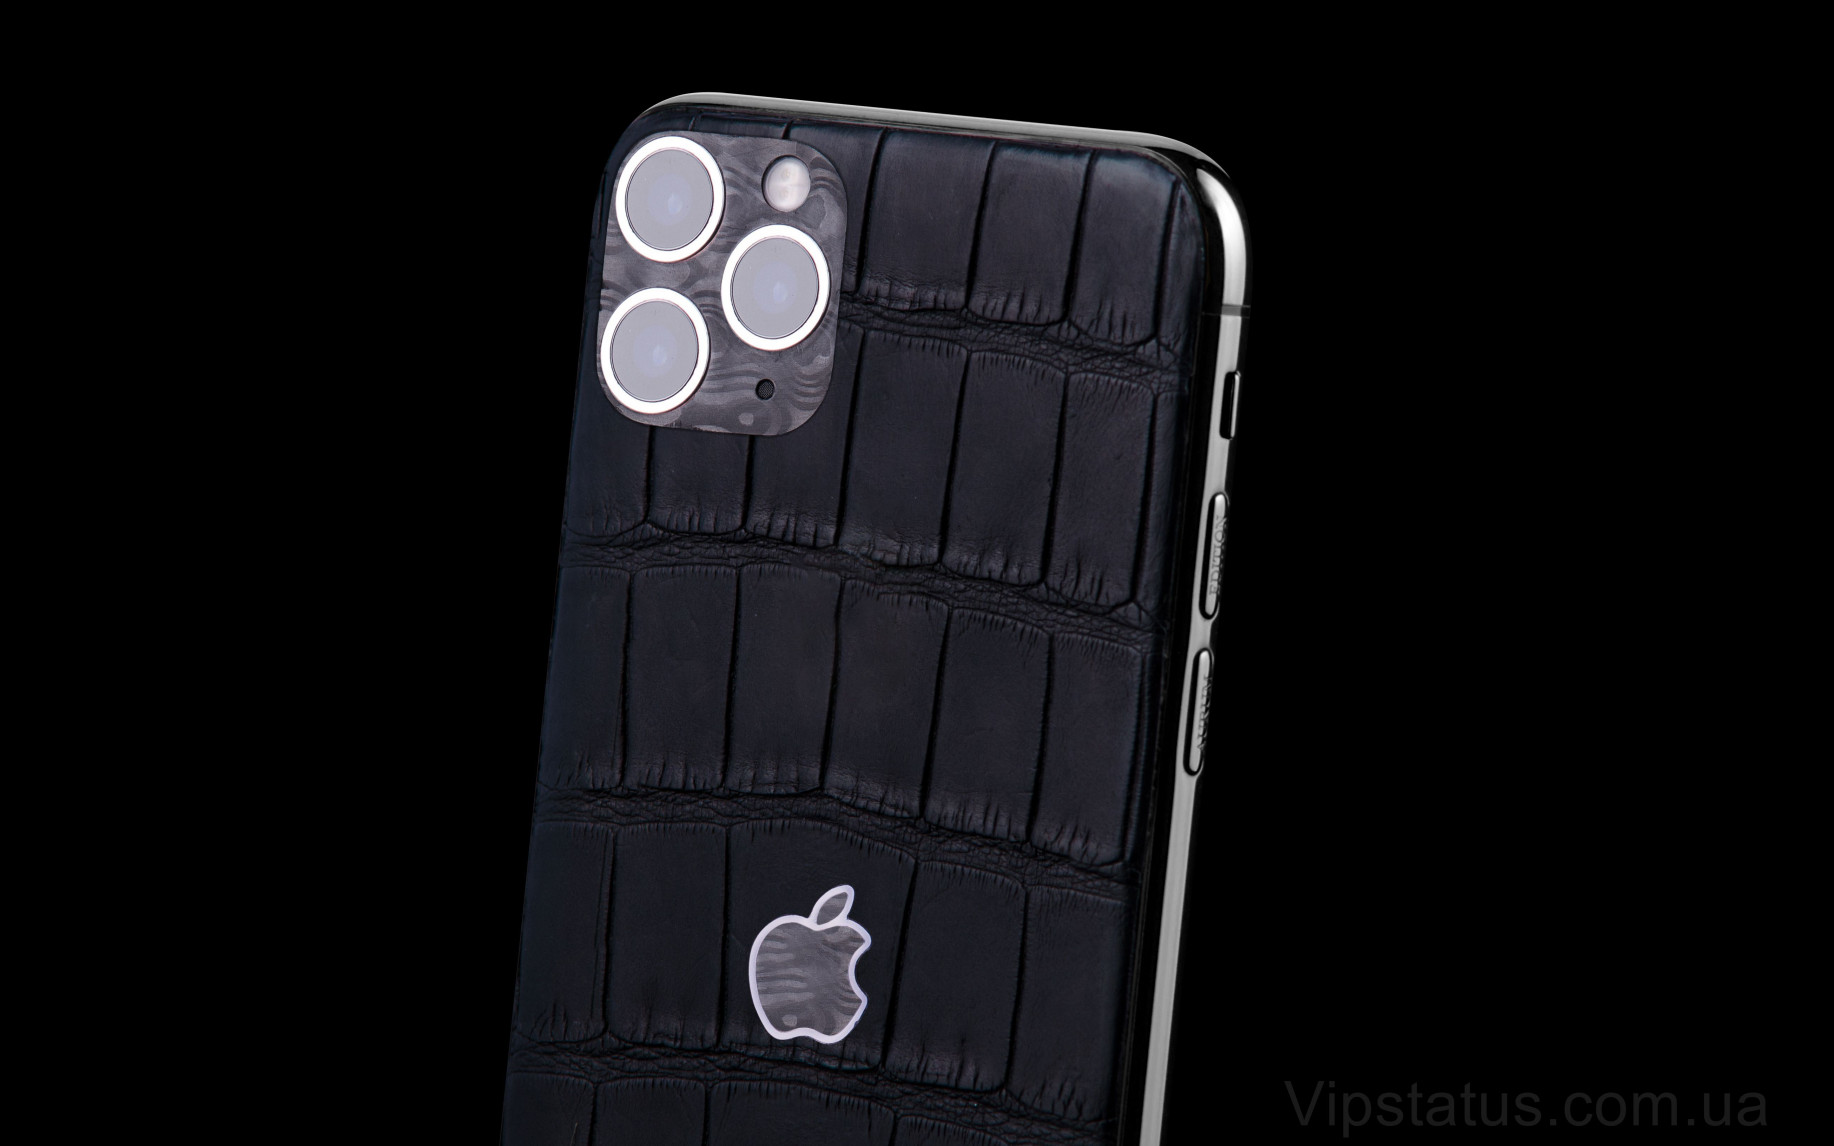 Elite Black Lord Carbon IPHONE 12 PRO MAX 512 GB Black Lord Carbon IPHONE 12 PRO MAX 512 GB image 2